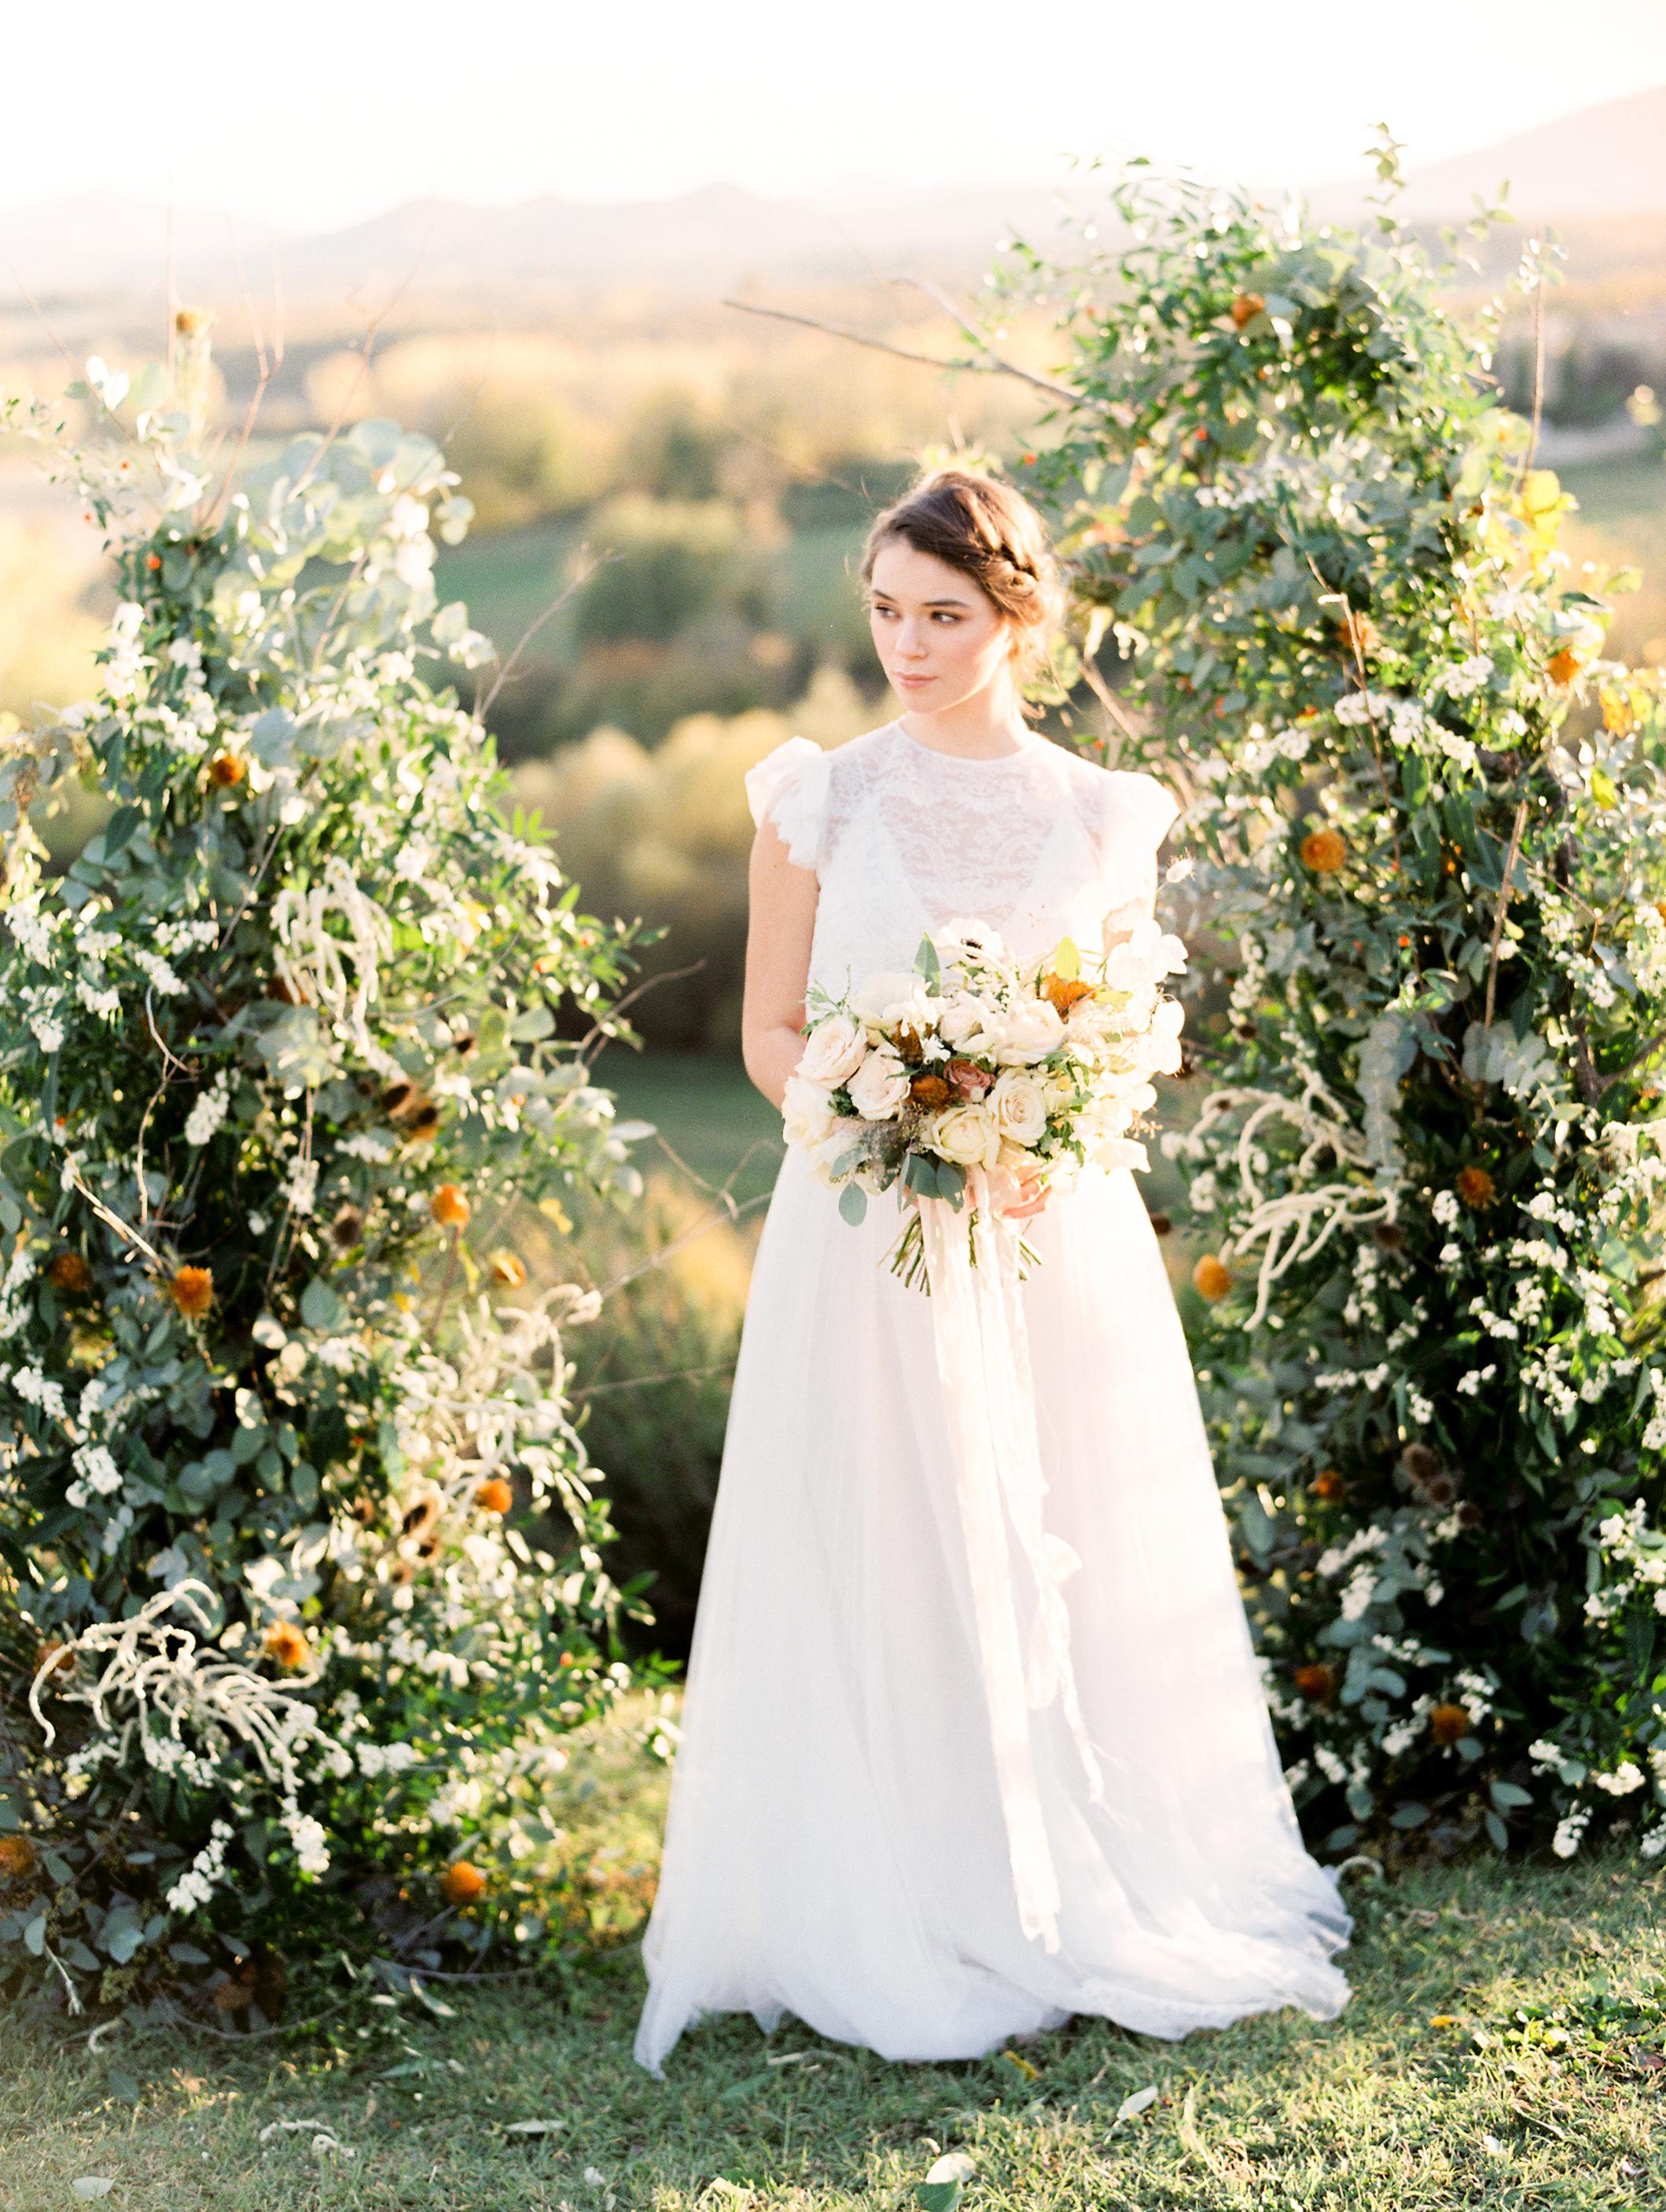 romantic-italy-wedding-in-tuscany-109.jpg